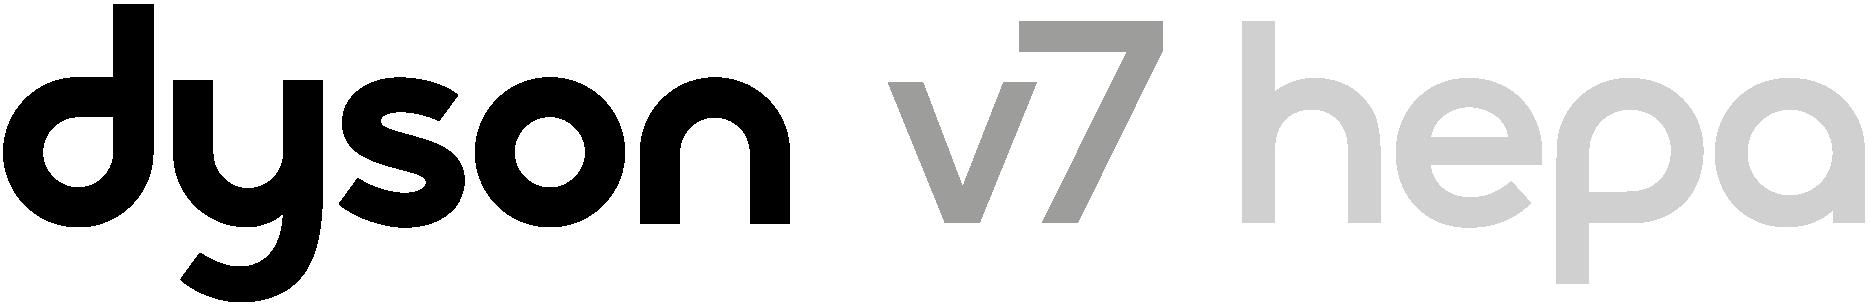 Dyson V7 Hepa vacuum logo